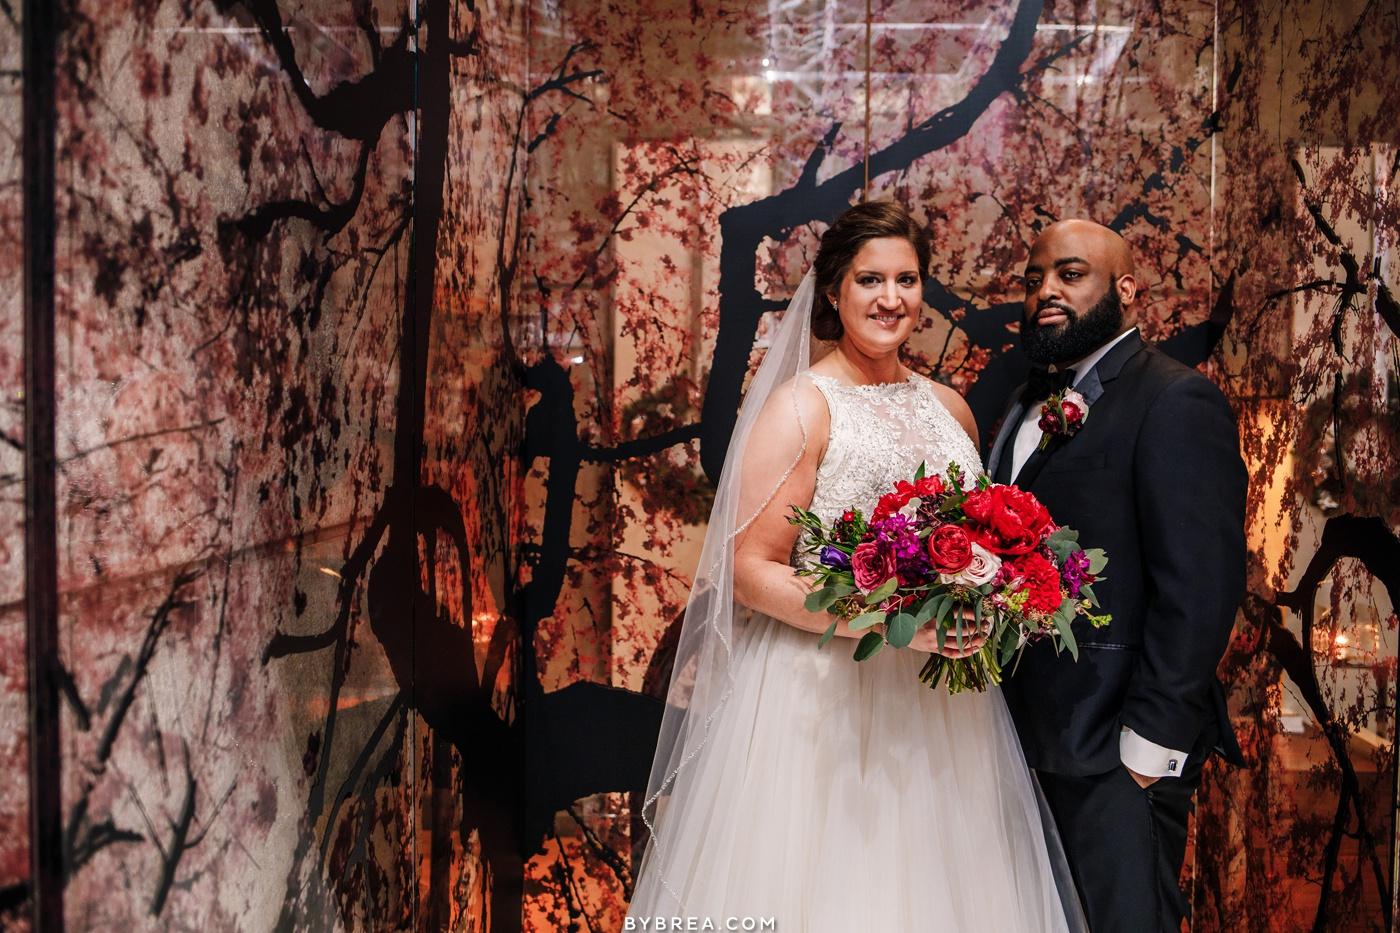 Portrait of bride and groom Park Hyatt Washington D.C.